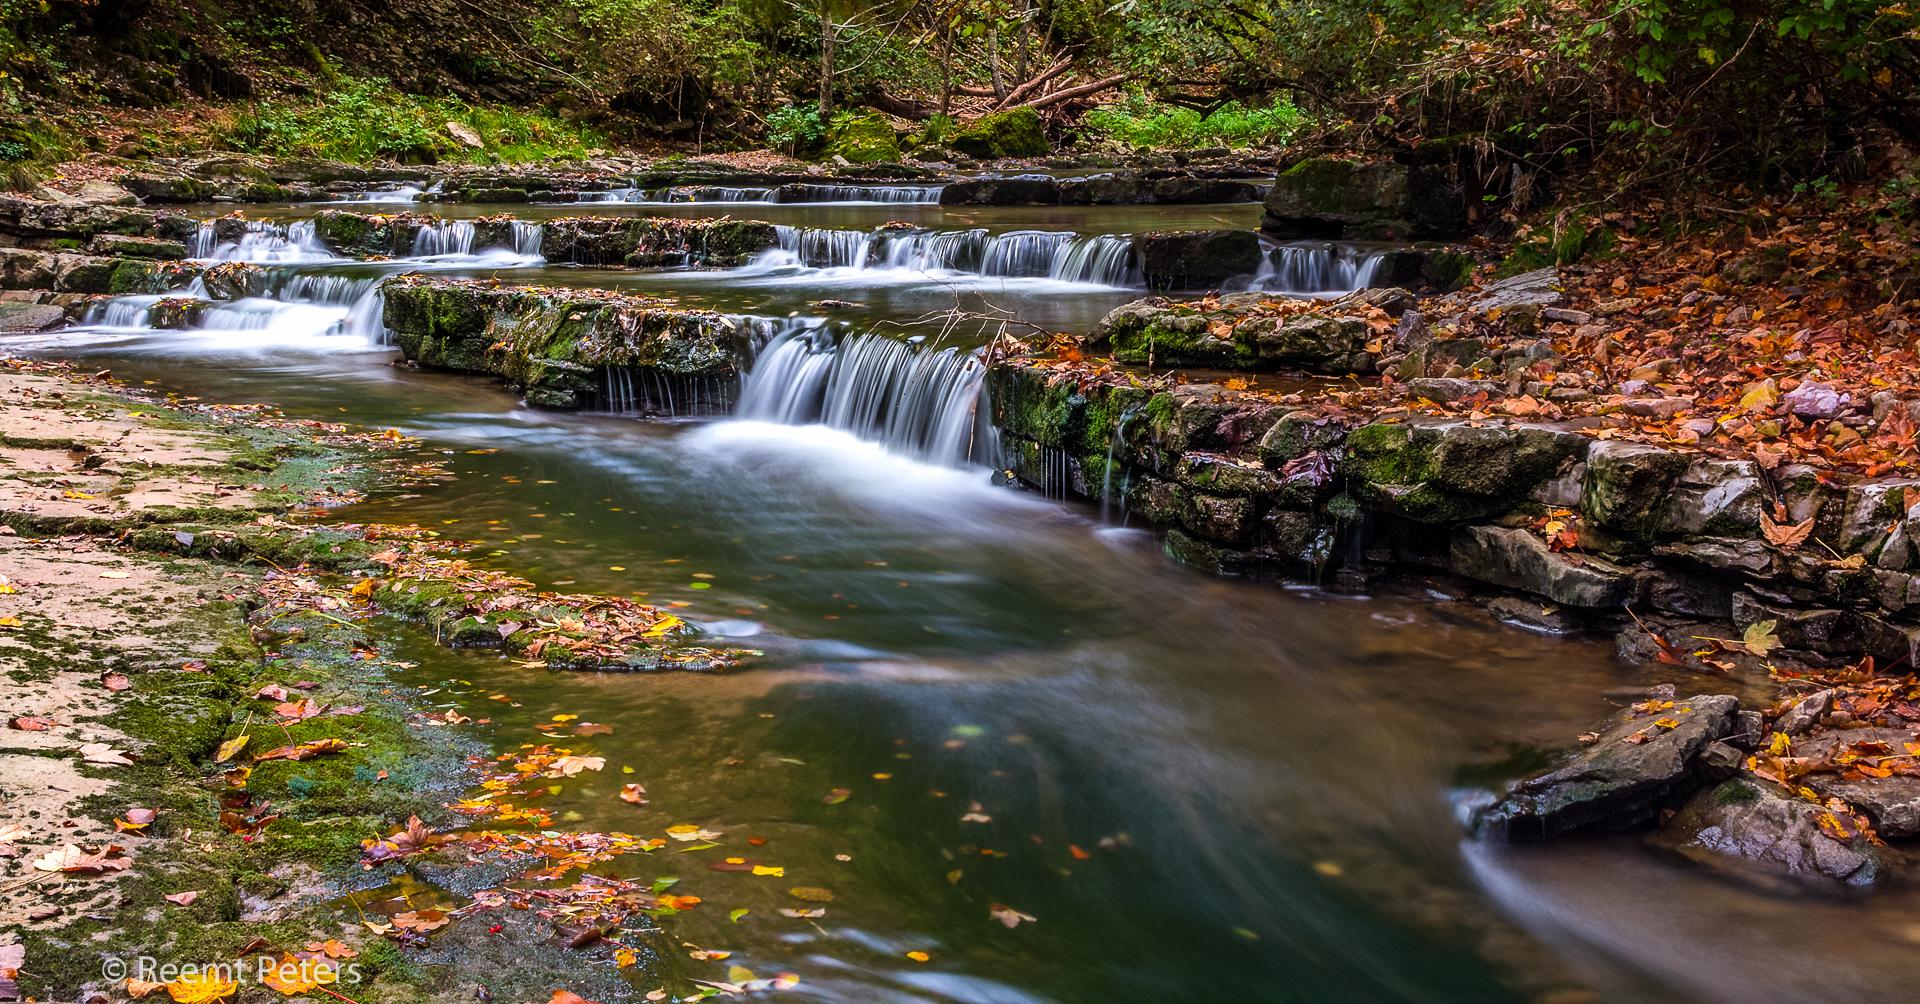 Schlichemklamm waterfall, Germany